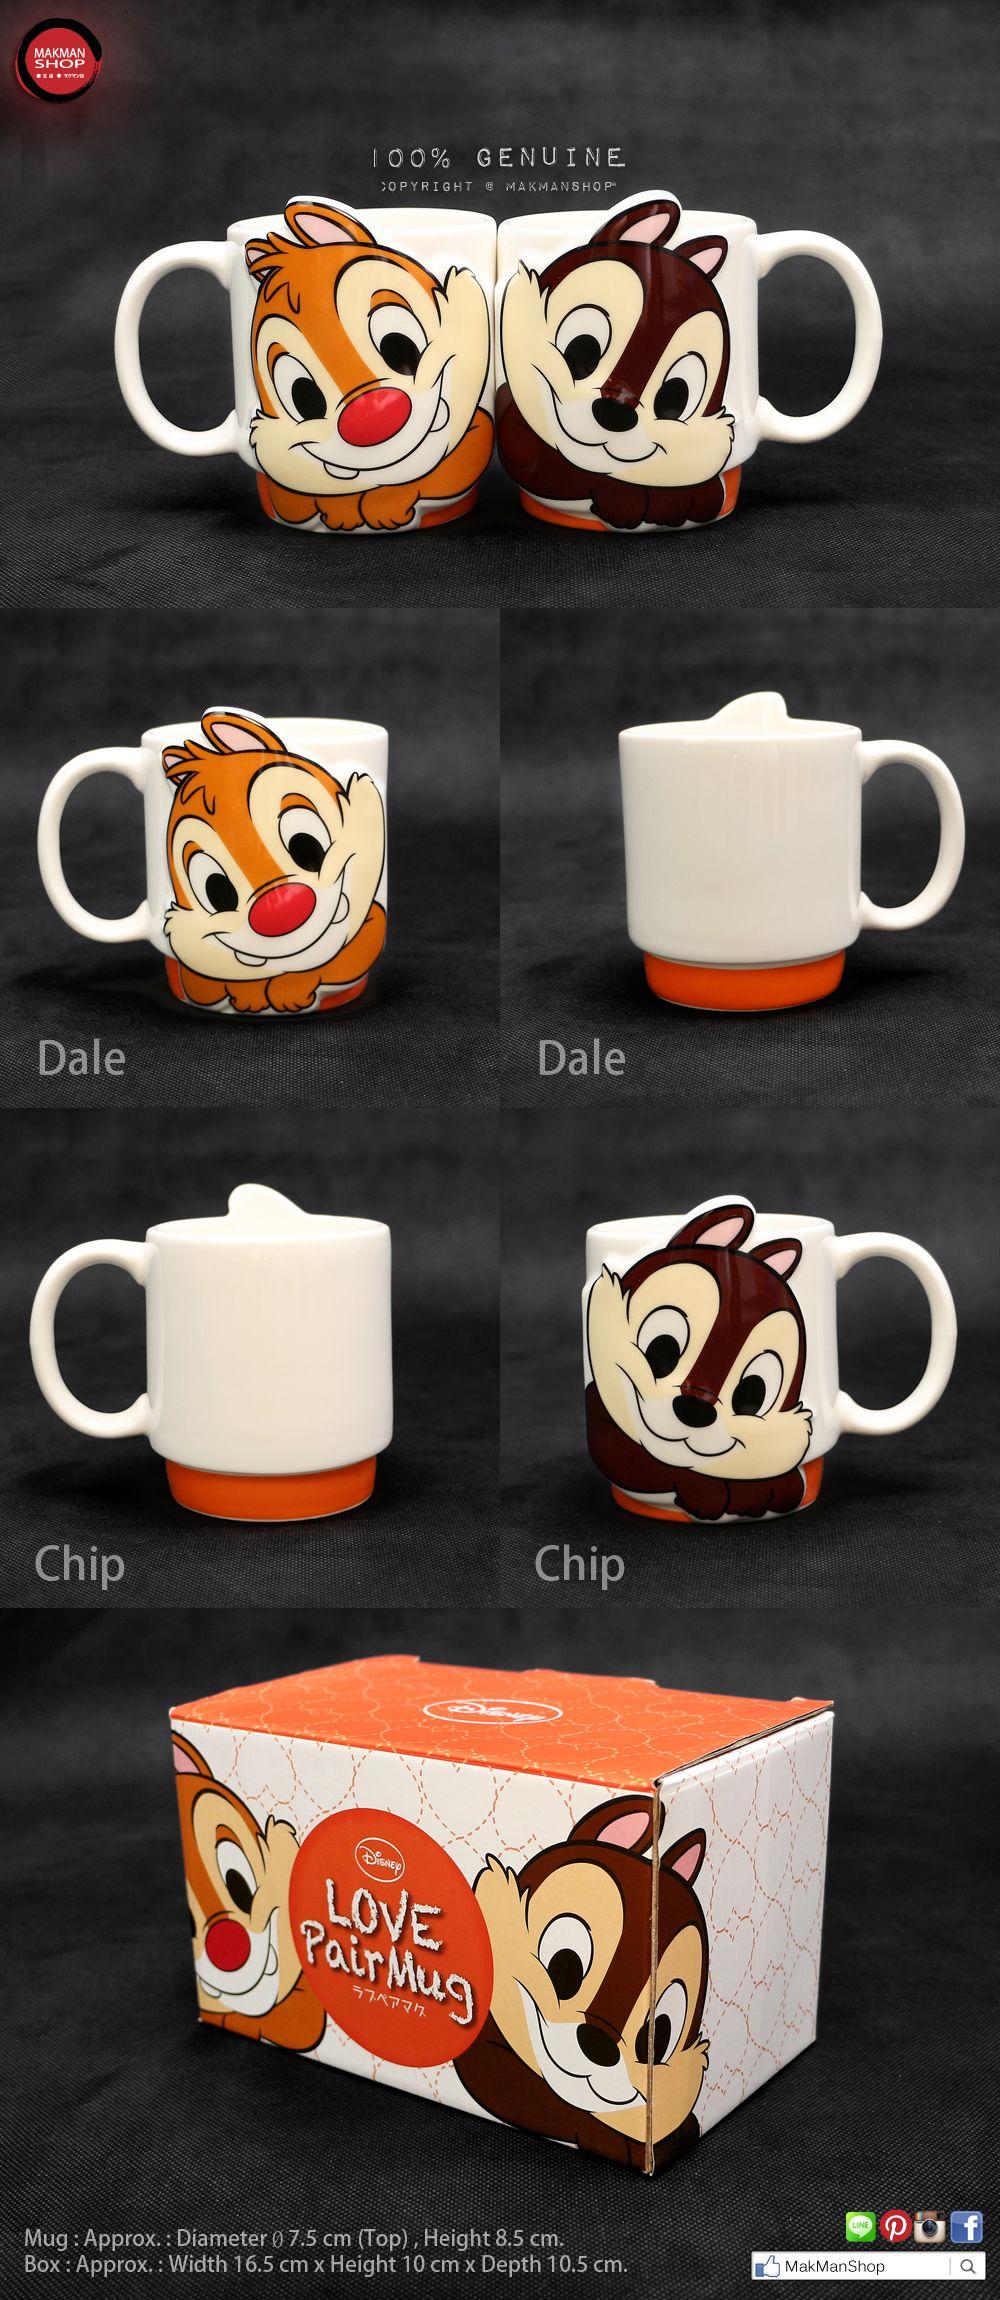 Dale Ceramics Disney Part Chipamp; Friends Orange Face Color SUzVqMp